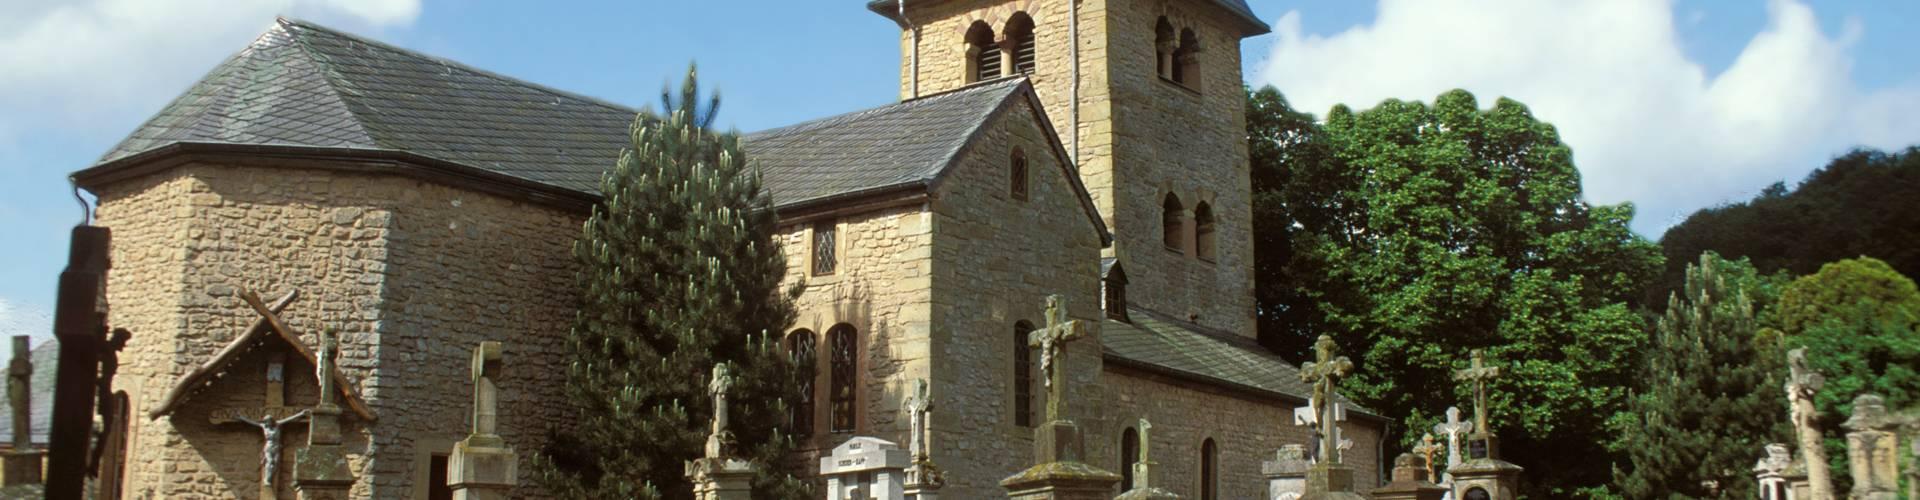 chapelle de girsterklaus